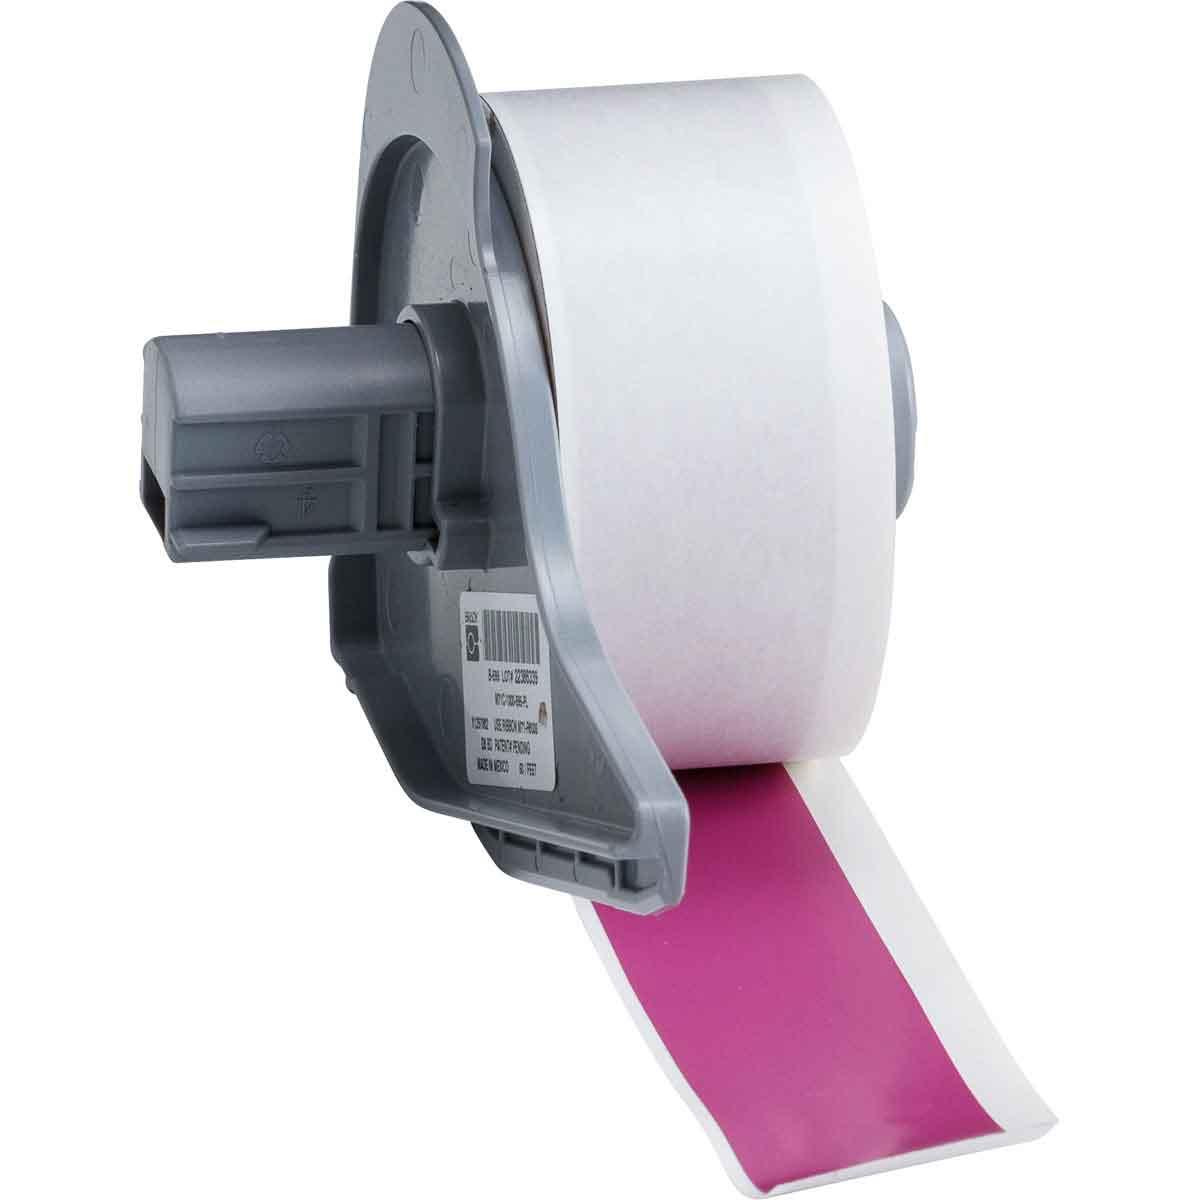 Brady® M71C-1000-595-PL Blank Thermal Transfer Tape, 50 ft L x 1 in W, Purple, B-595 Vinyl, Permanent Acrylic Adhesive, -40 to 180 deg F